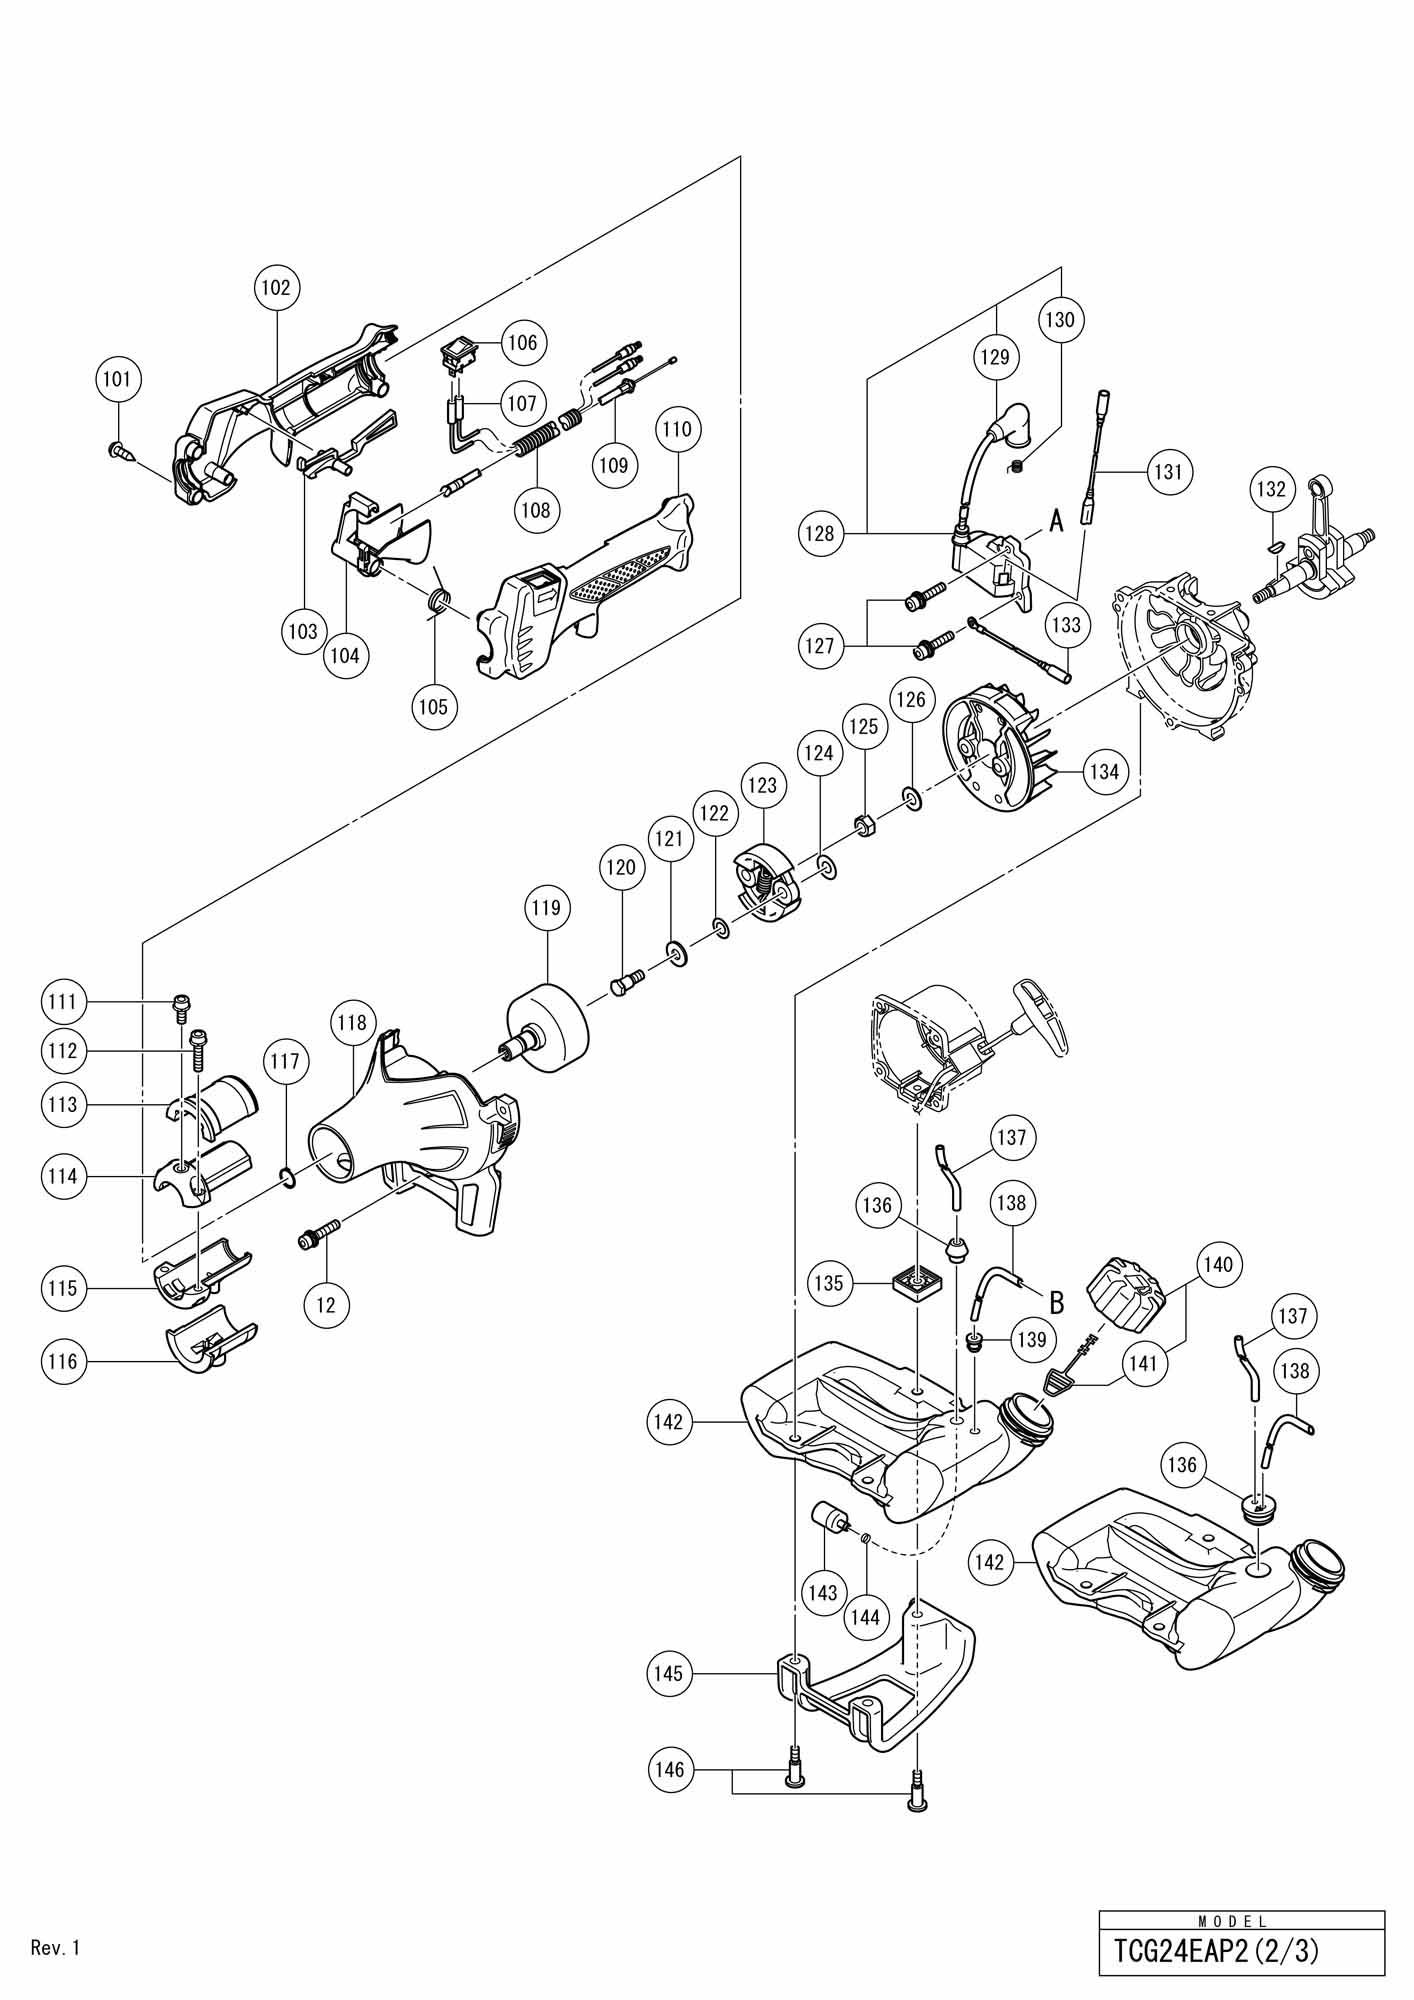 Hitachi Engine Grass Trimmer Tcg 24eap2 SPARE_TCG24EAP2